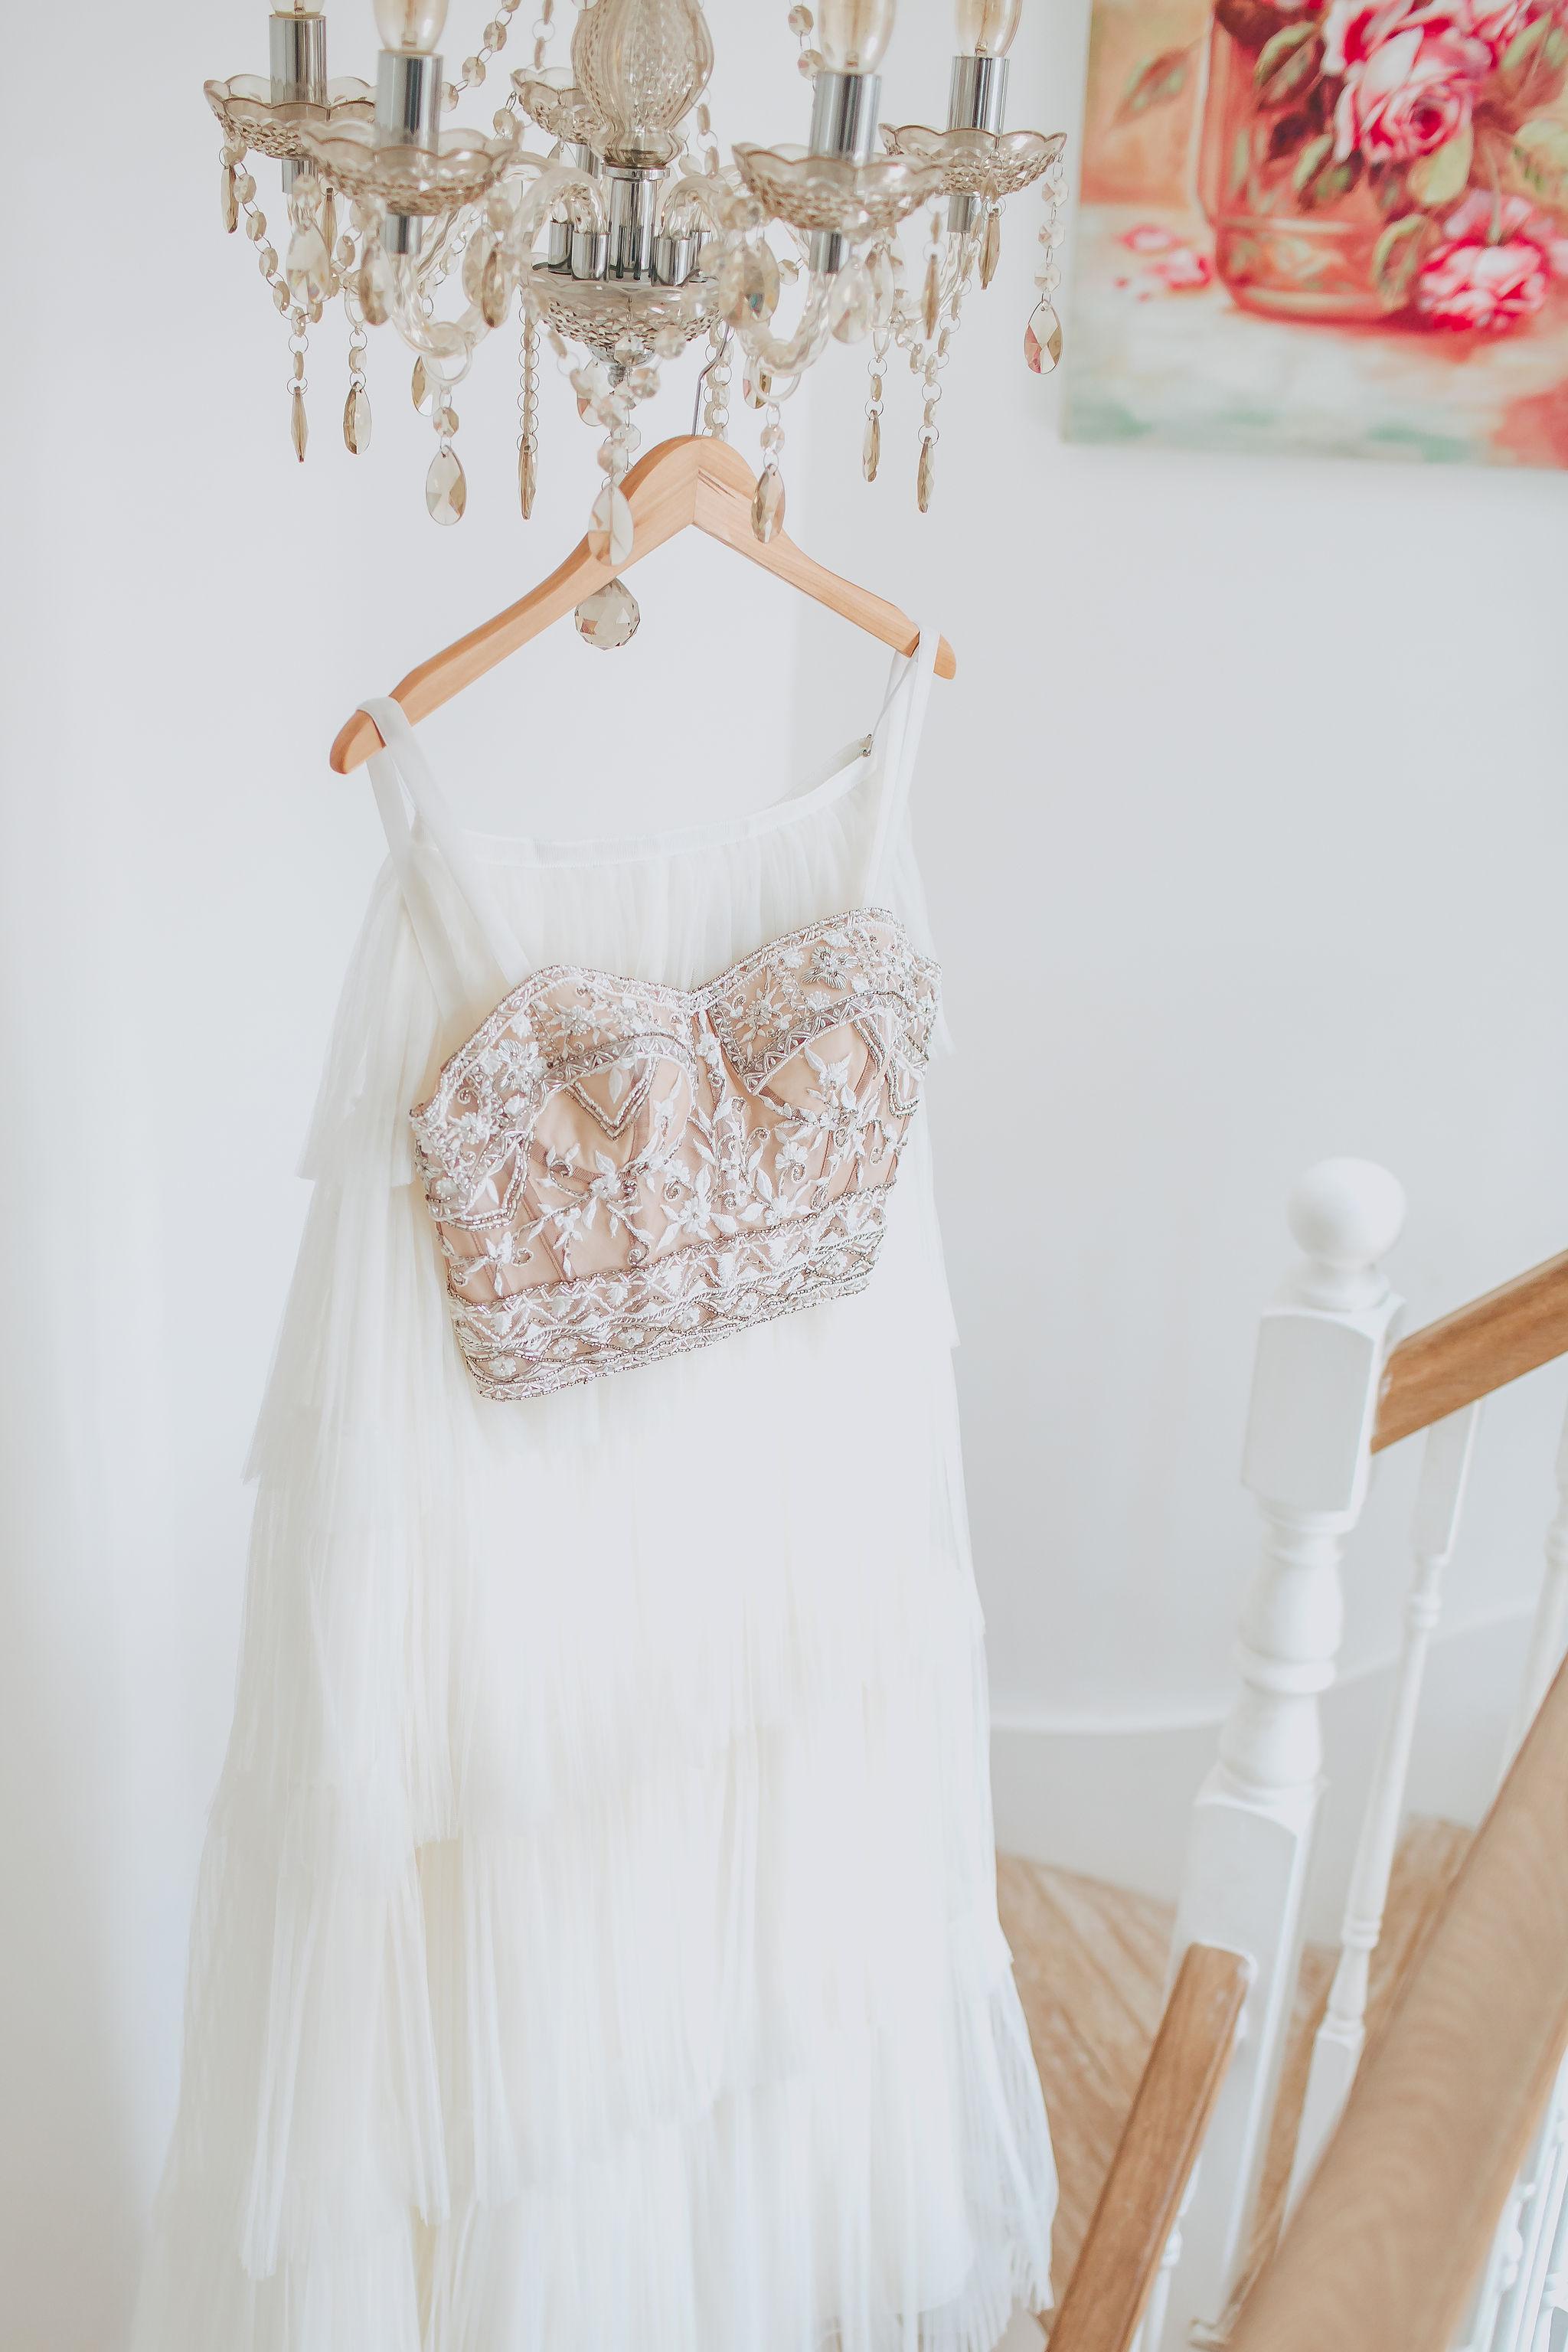 canvas-and-light-white-tipis-bridal-indulgence.jpg